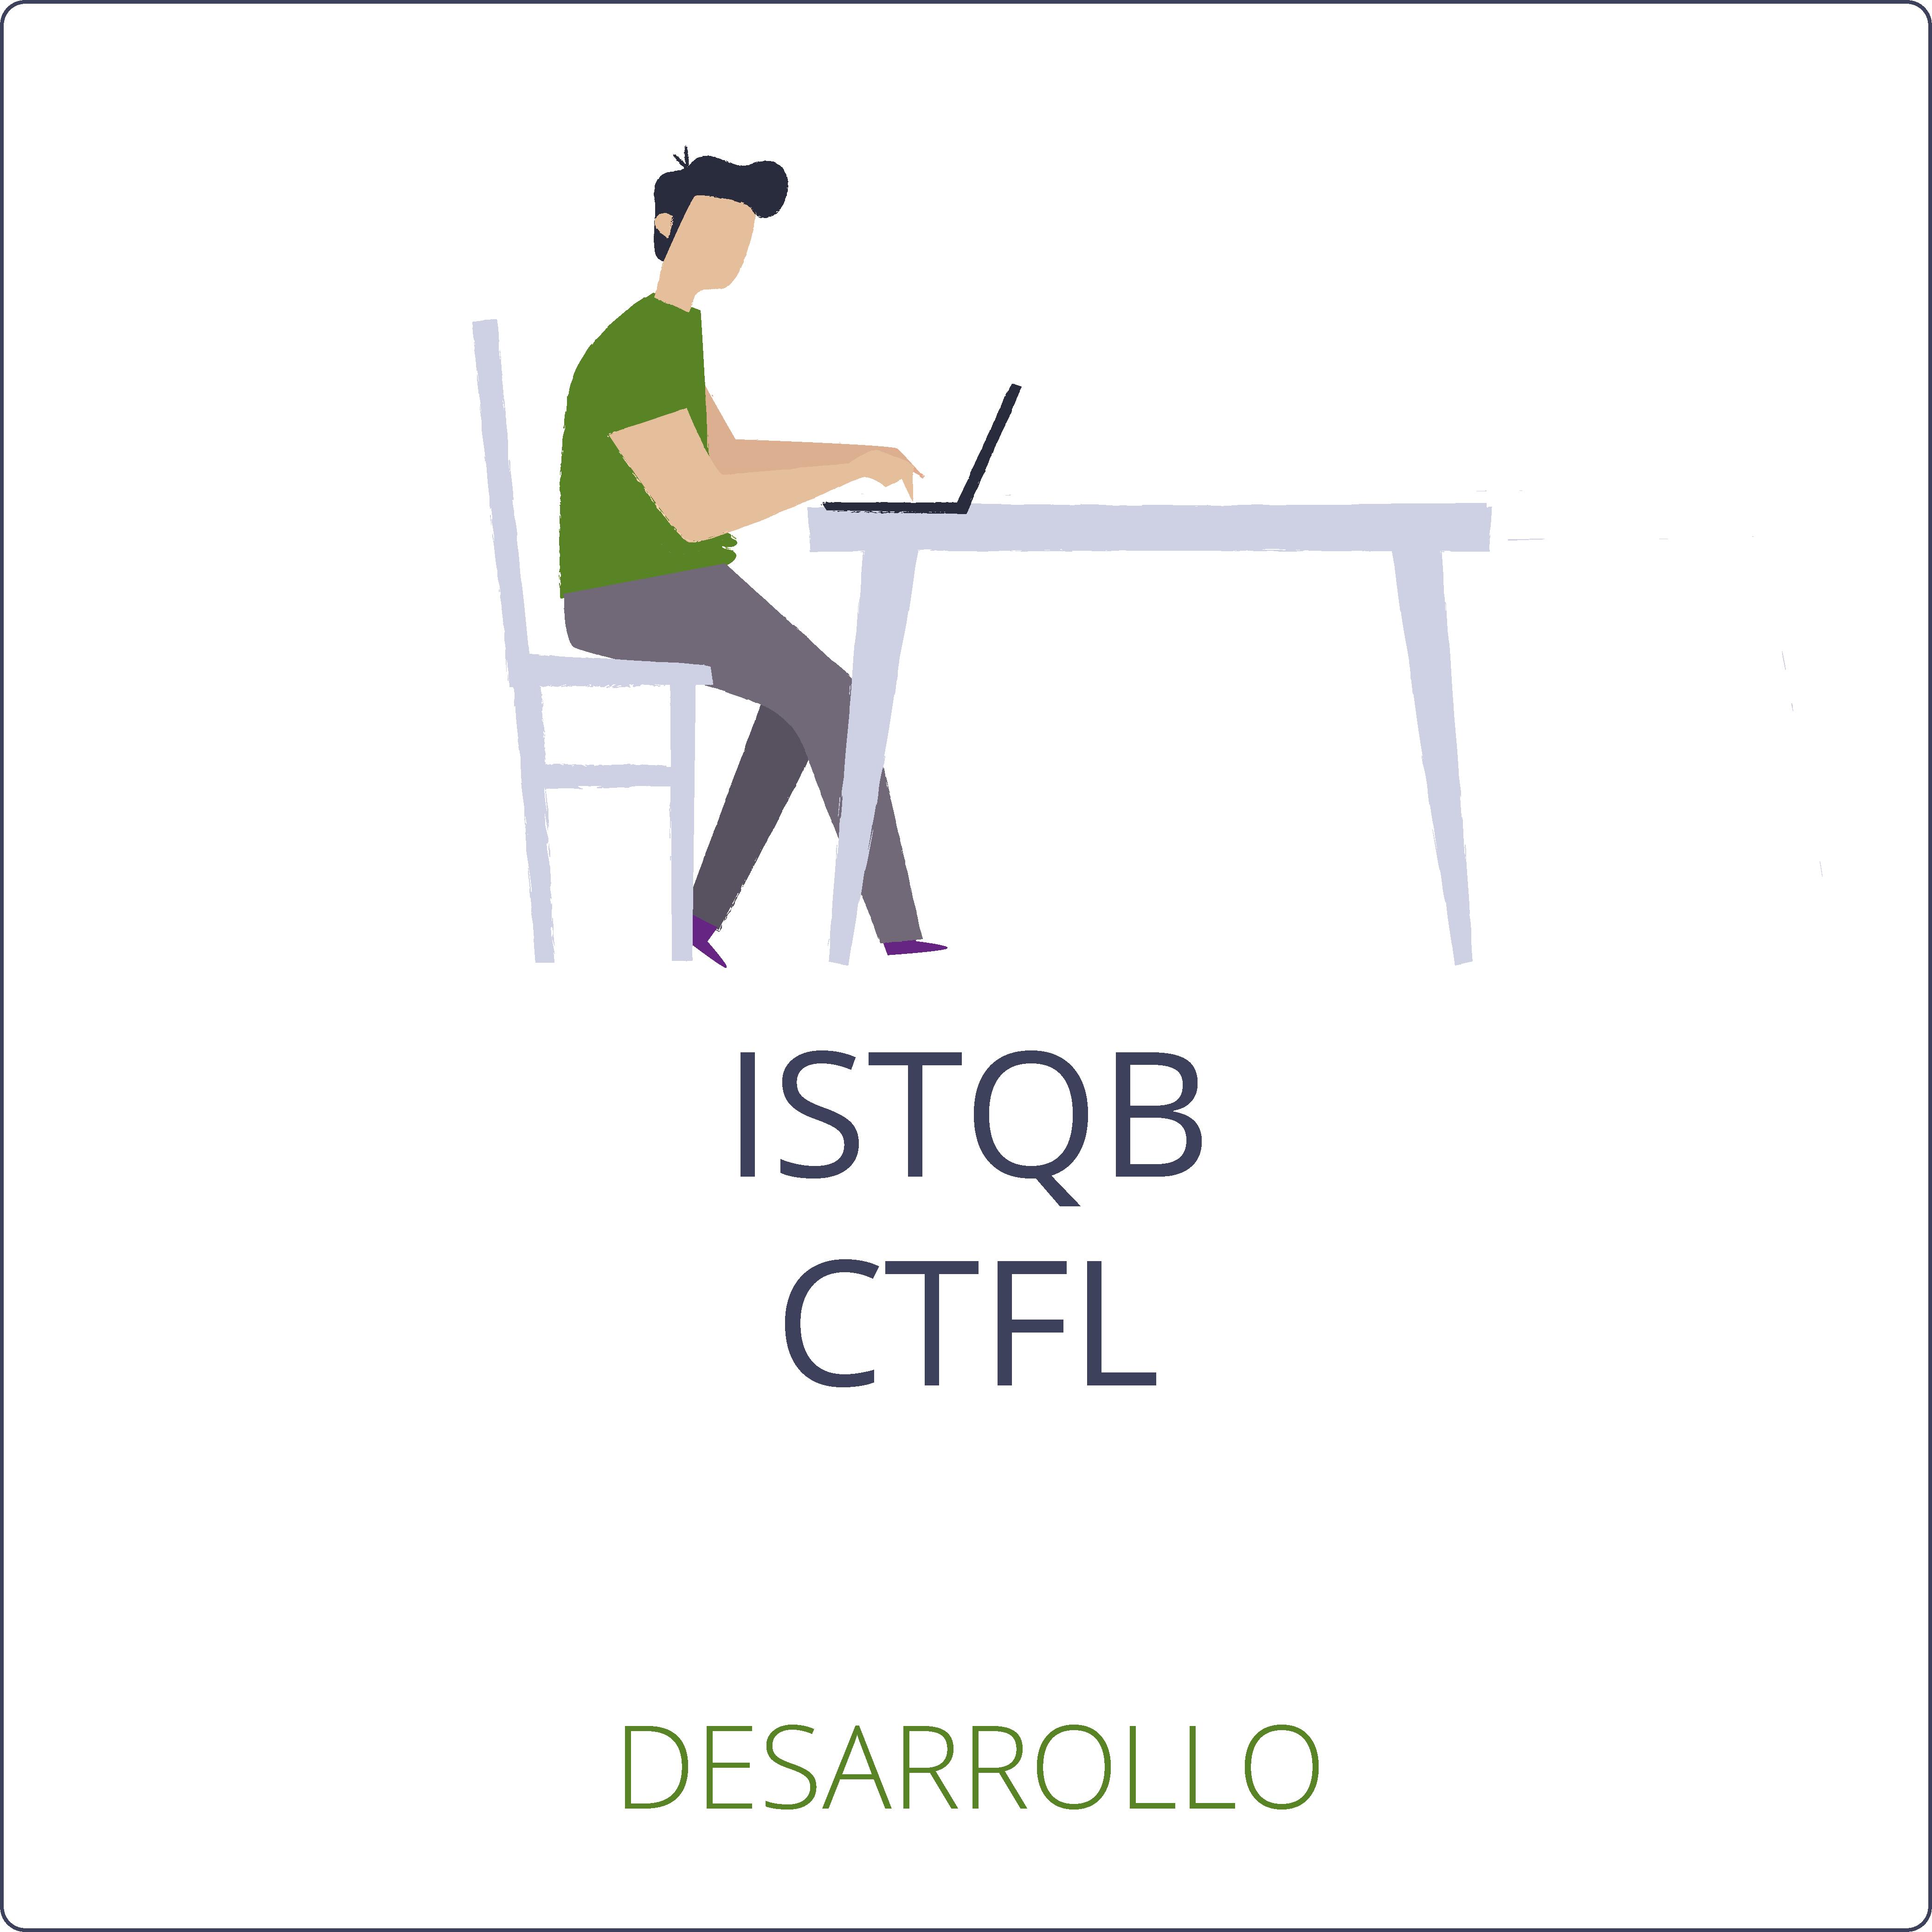 ISTQB CTFL